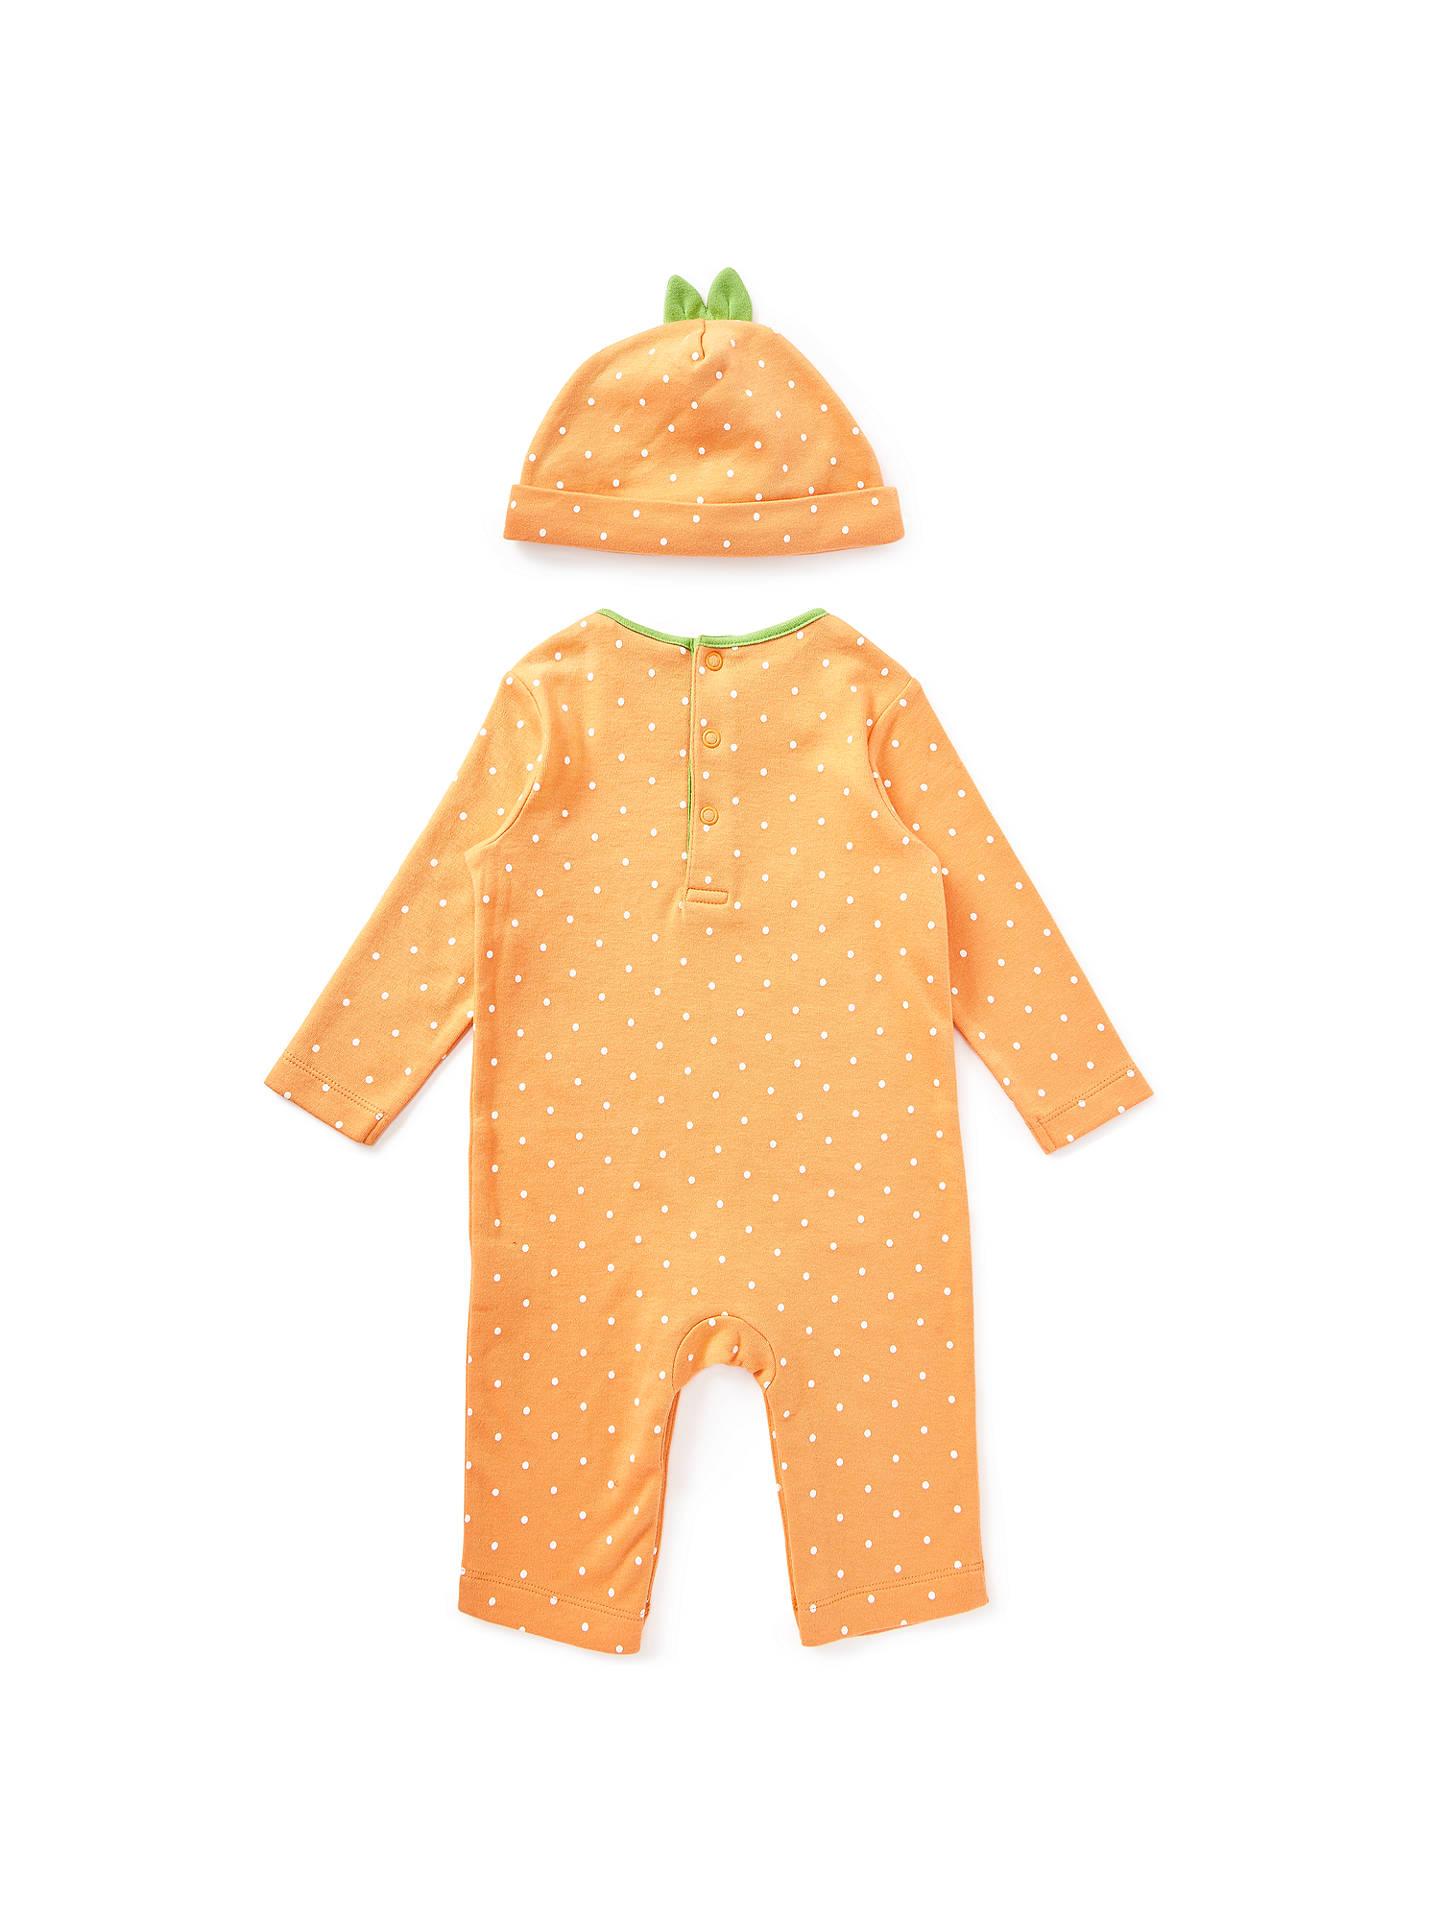 Pottery Barn Kids Halloween Childrens Pumpkin costume BABY 0-3 MONTHS baby 4 pc